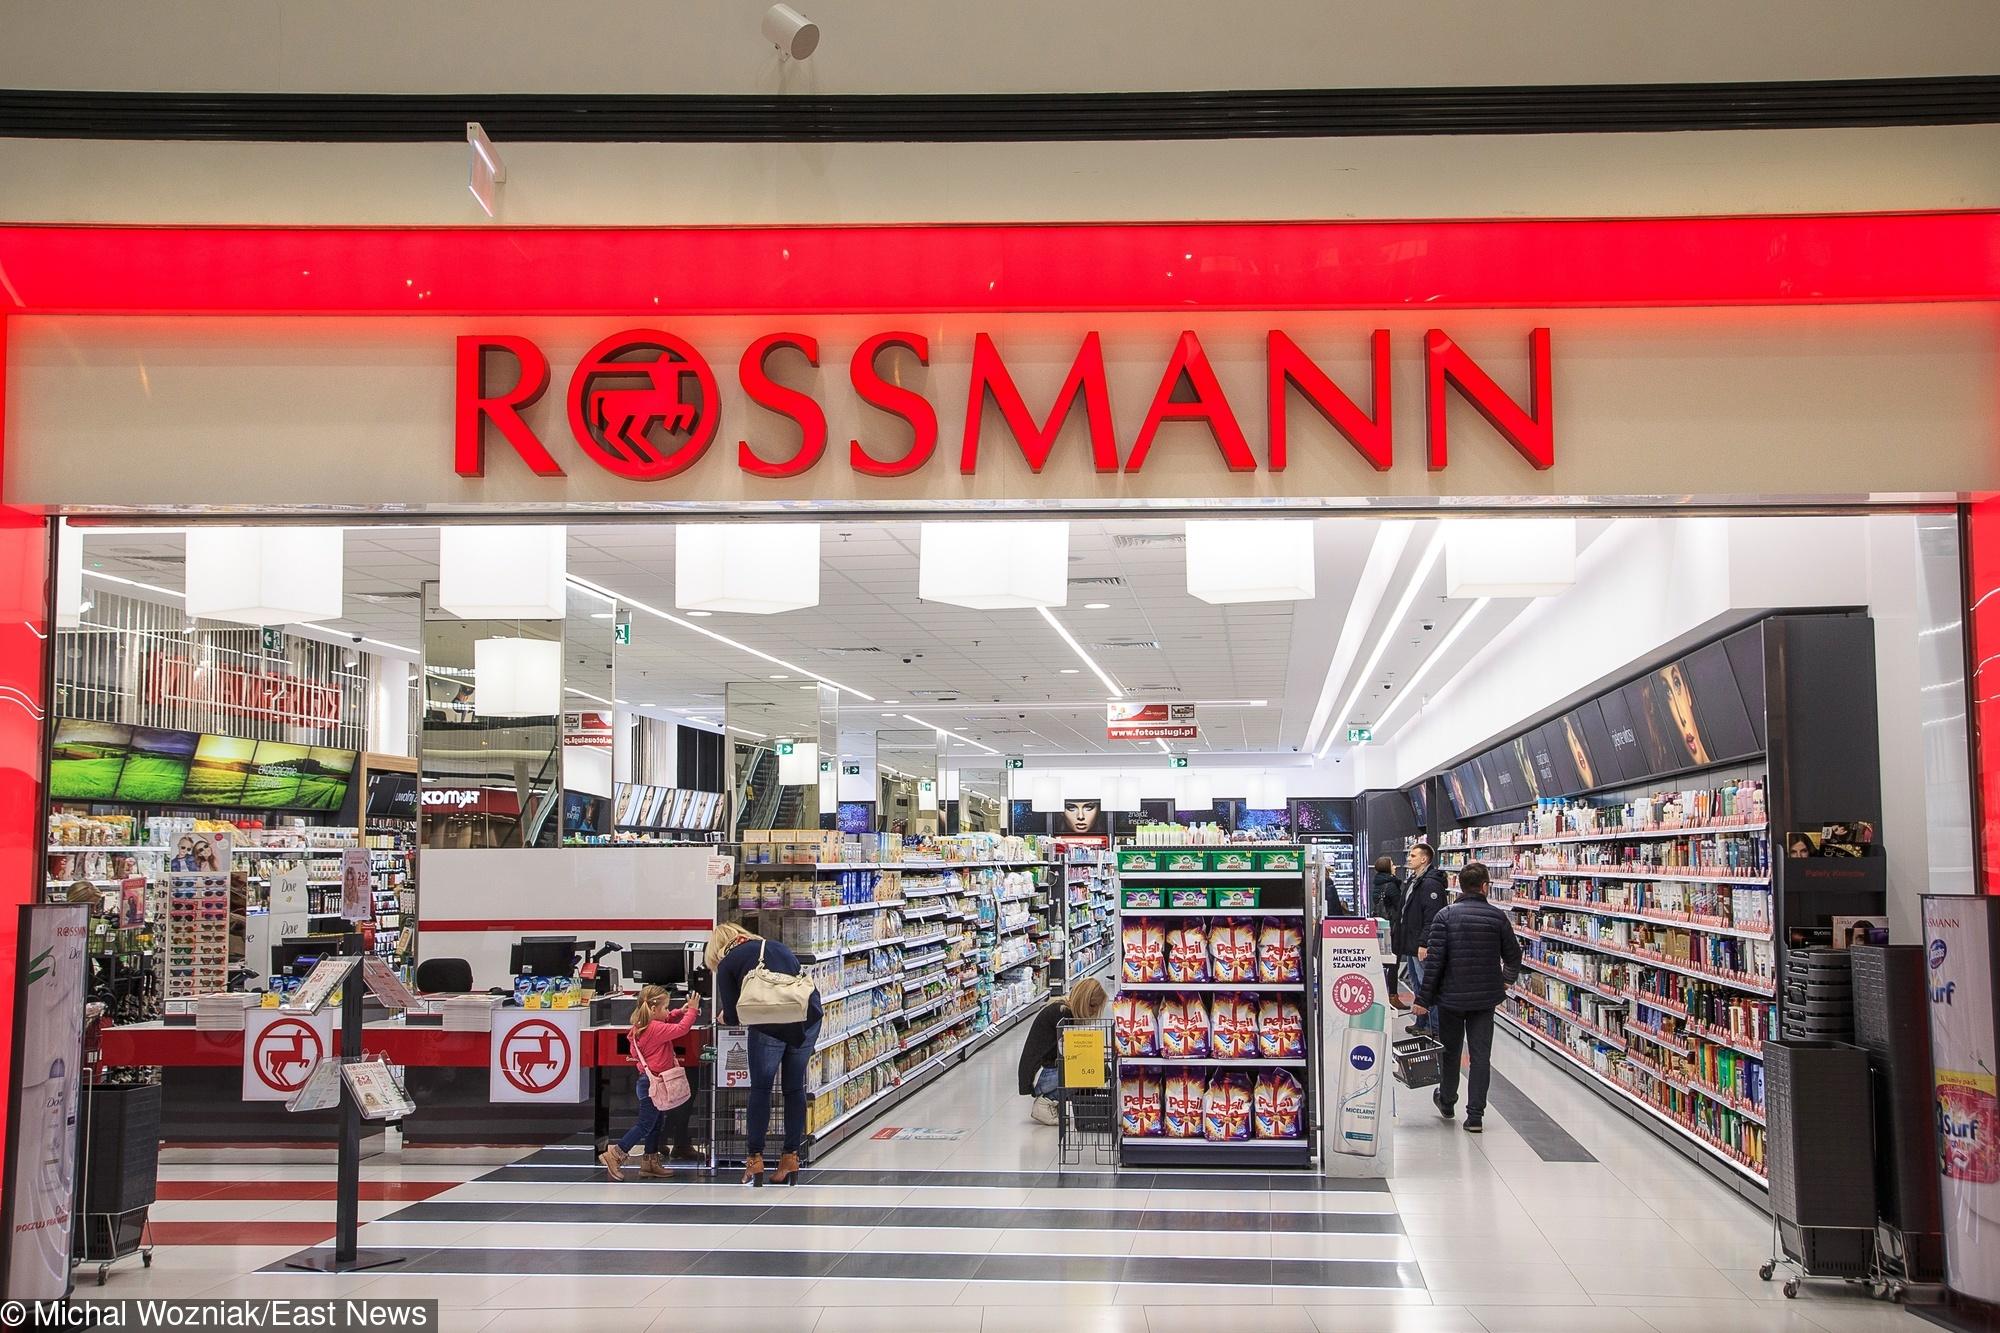 Rossmanm